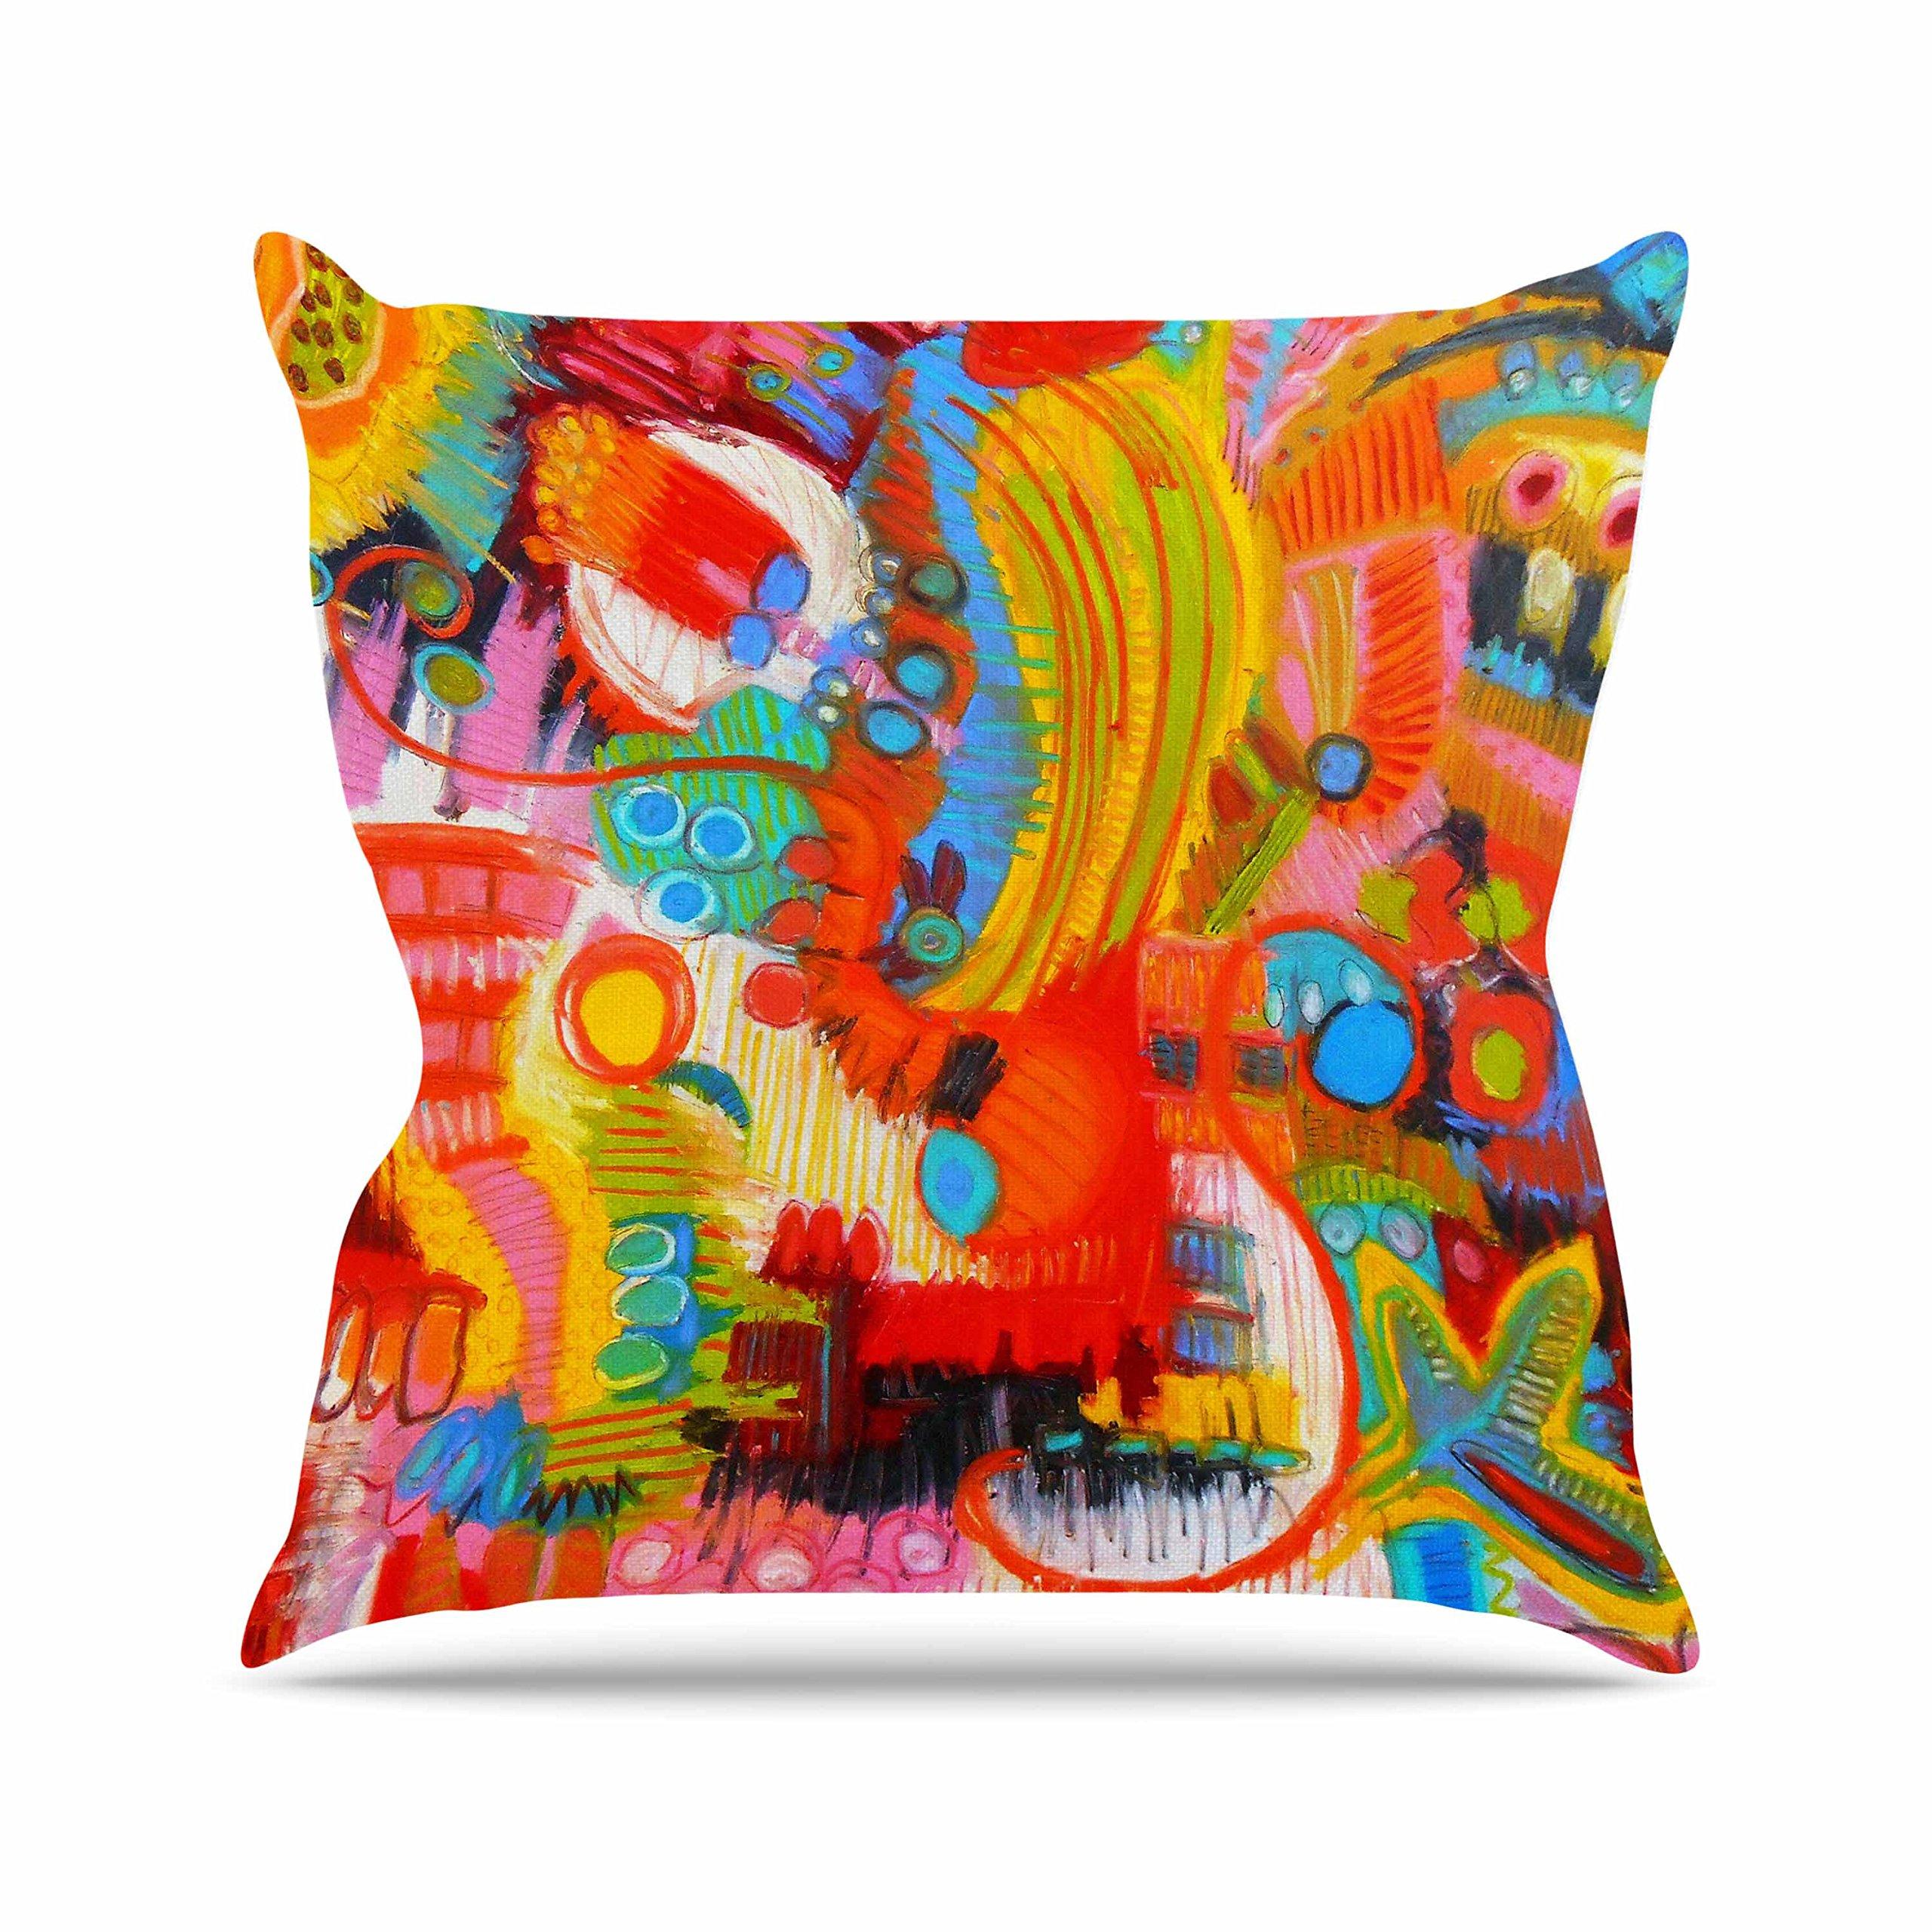 Kess InHouse Jeff Ferst Flower Power Abstract Multicolor Outdoor Throw Pillow, 18'' x 18''